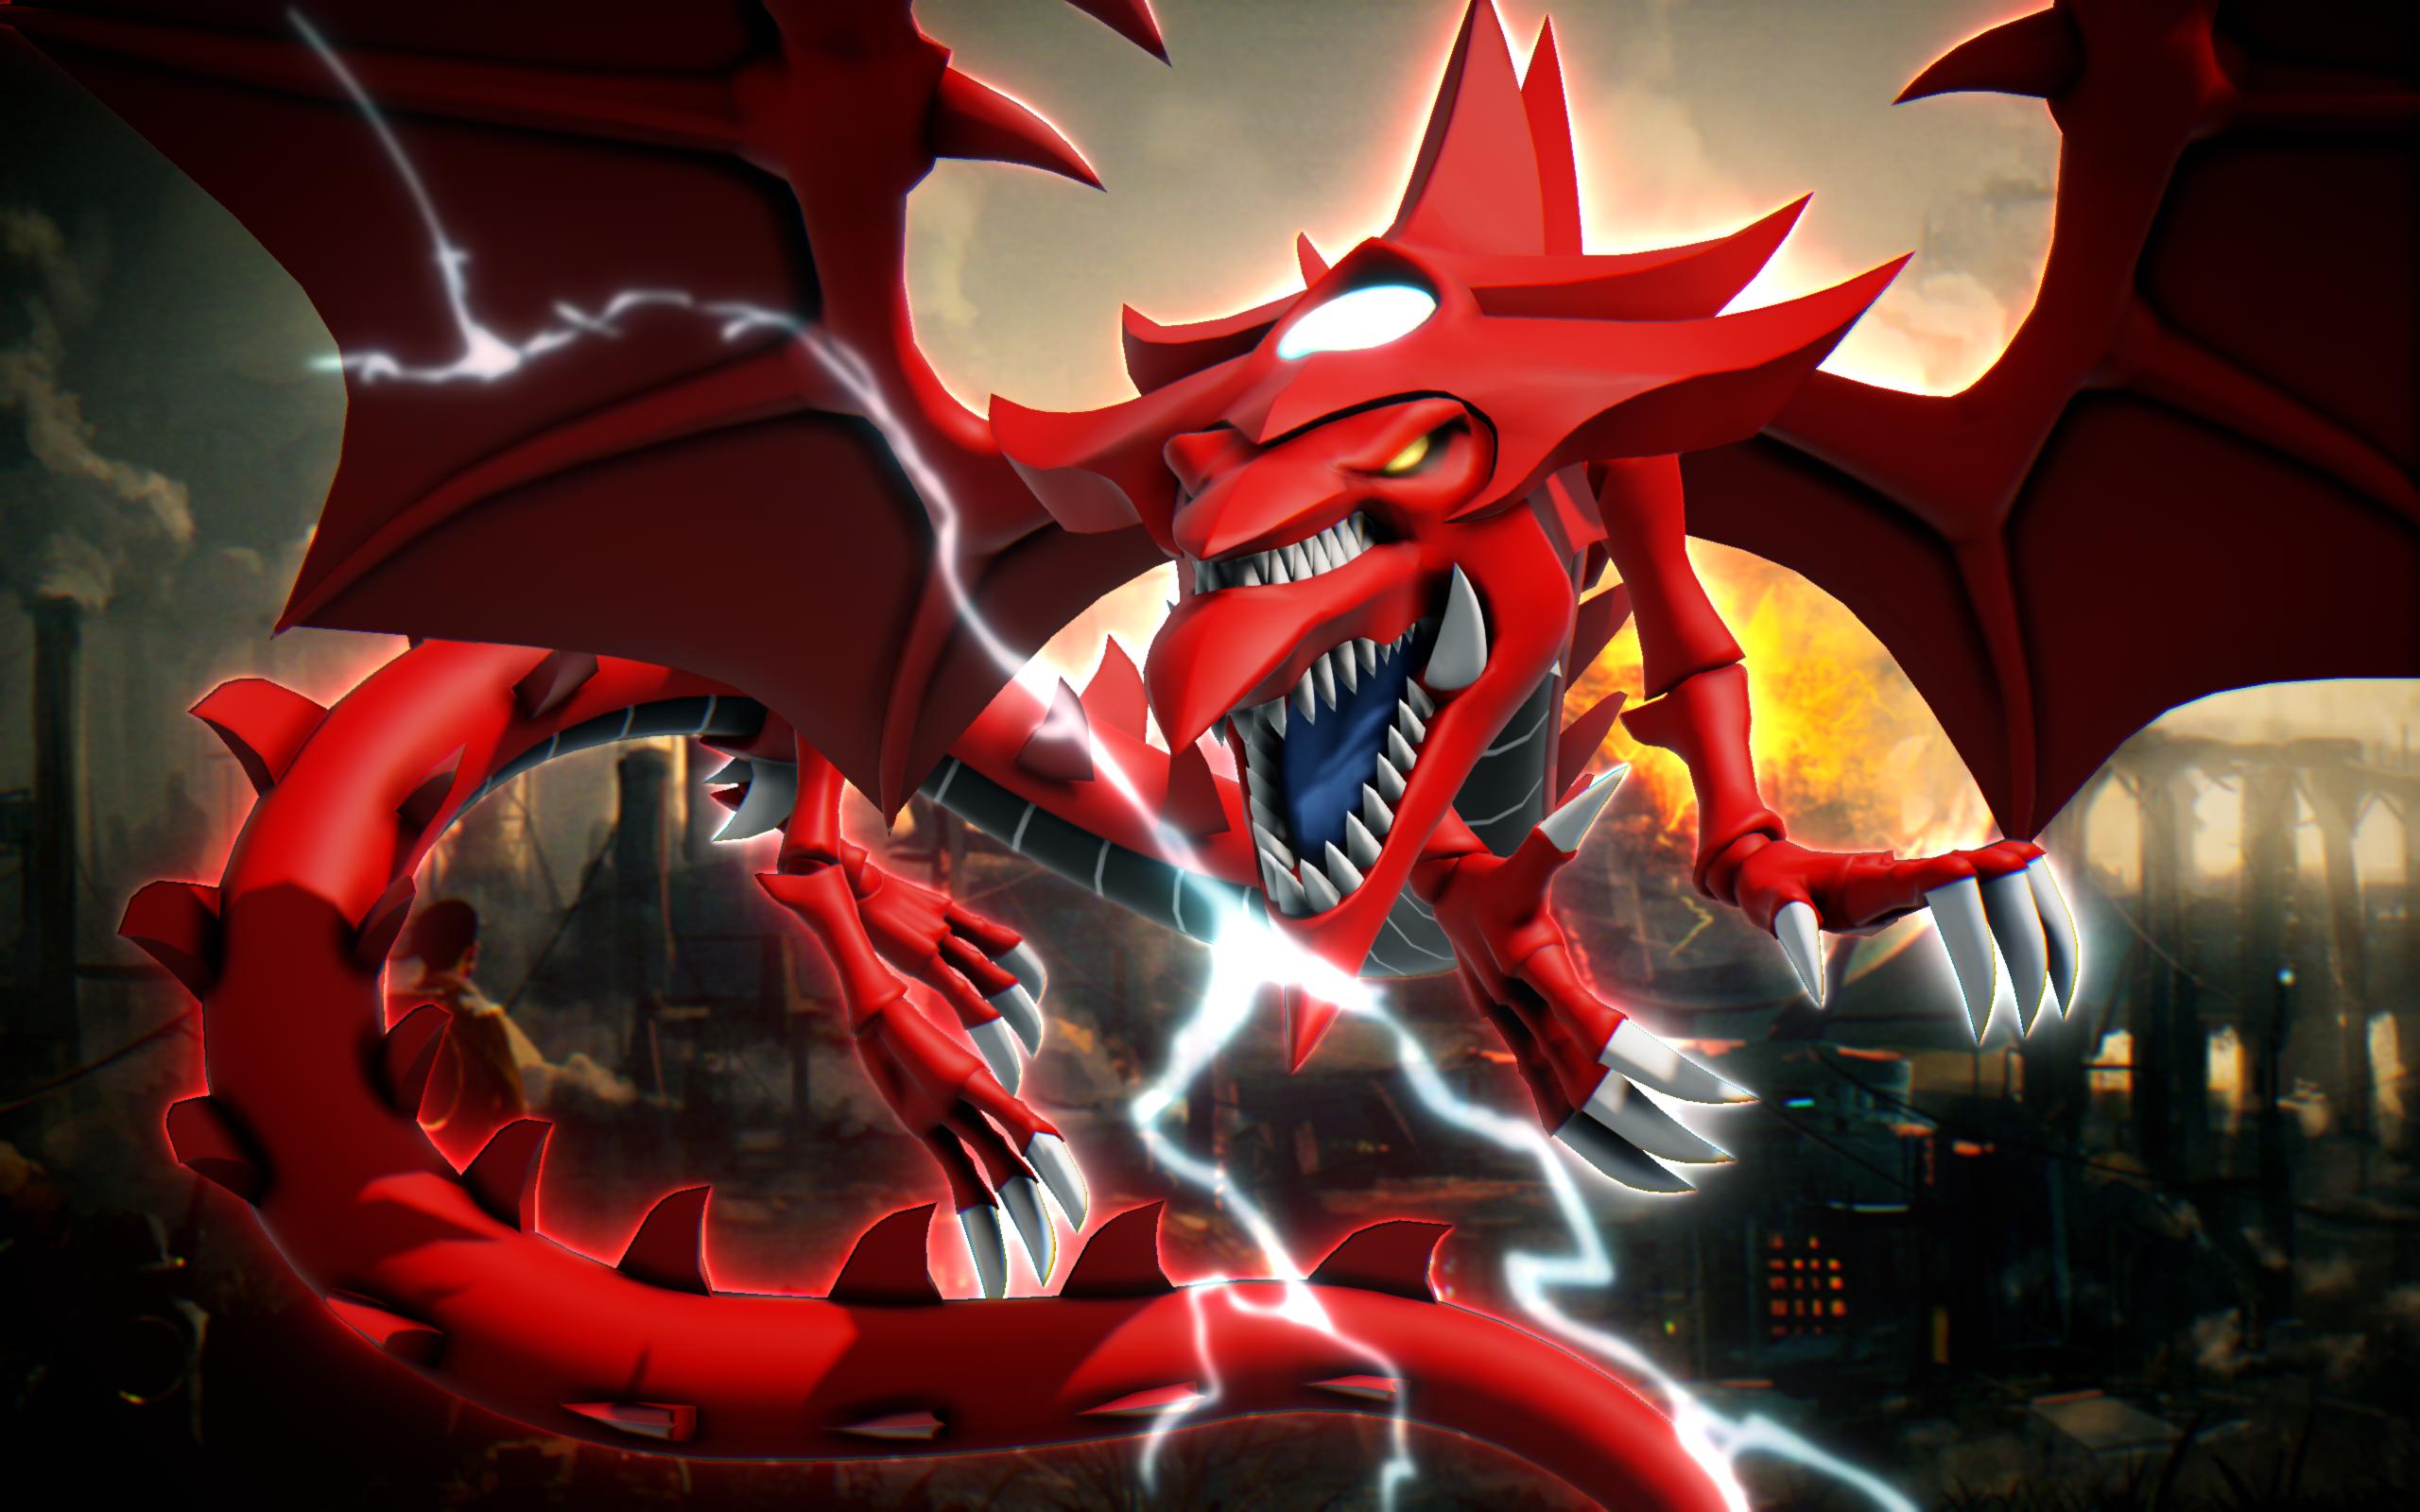 Yu Gi Oh HD Wallpaper Background Image 2560x1600 ID950981 2560x1600